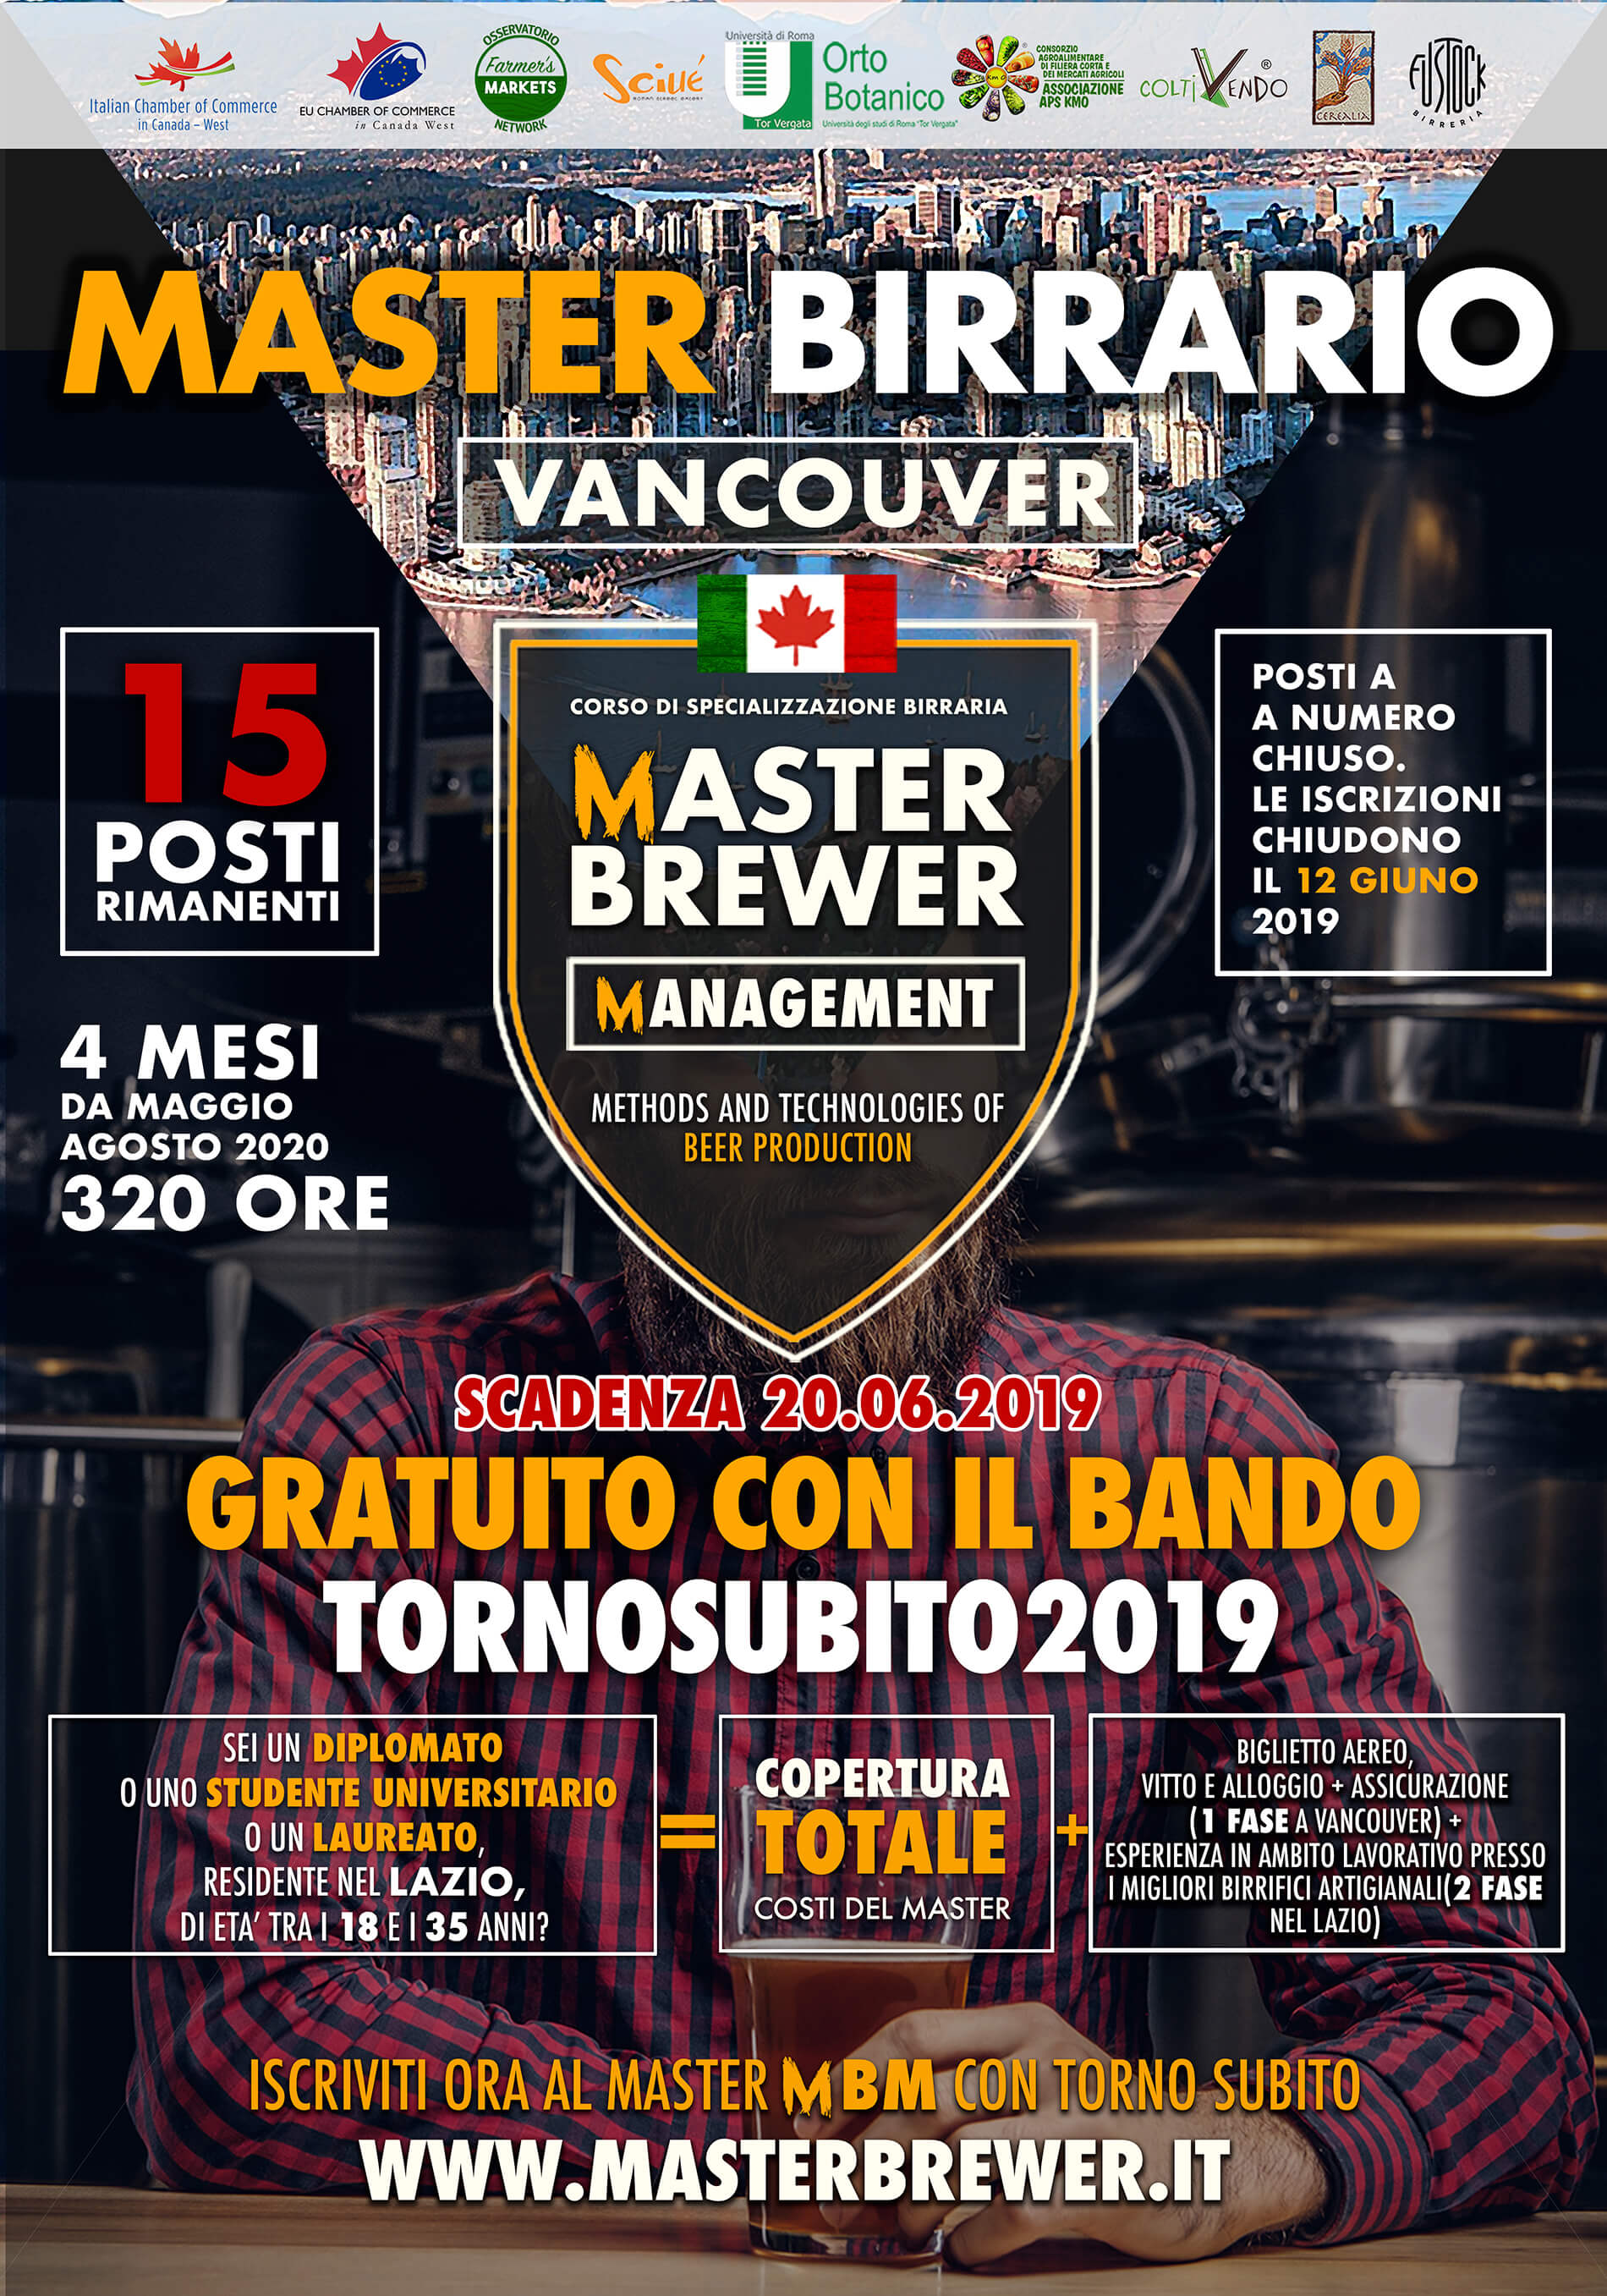 Master Birrario Vancouver